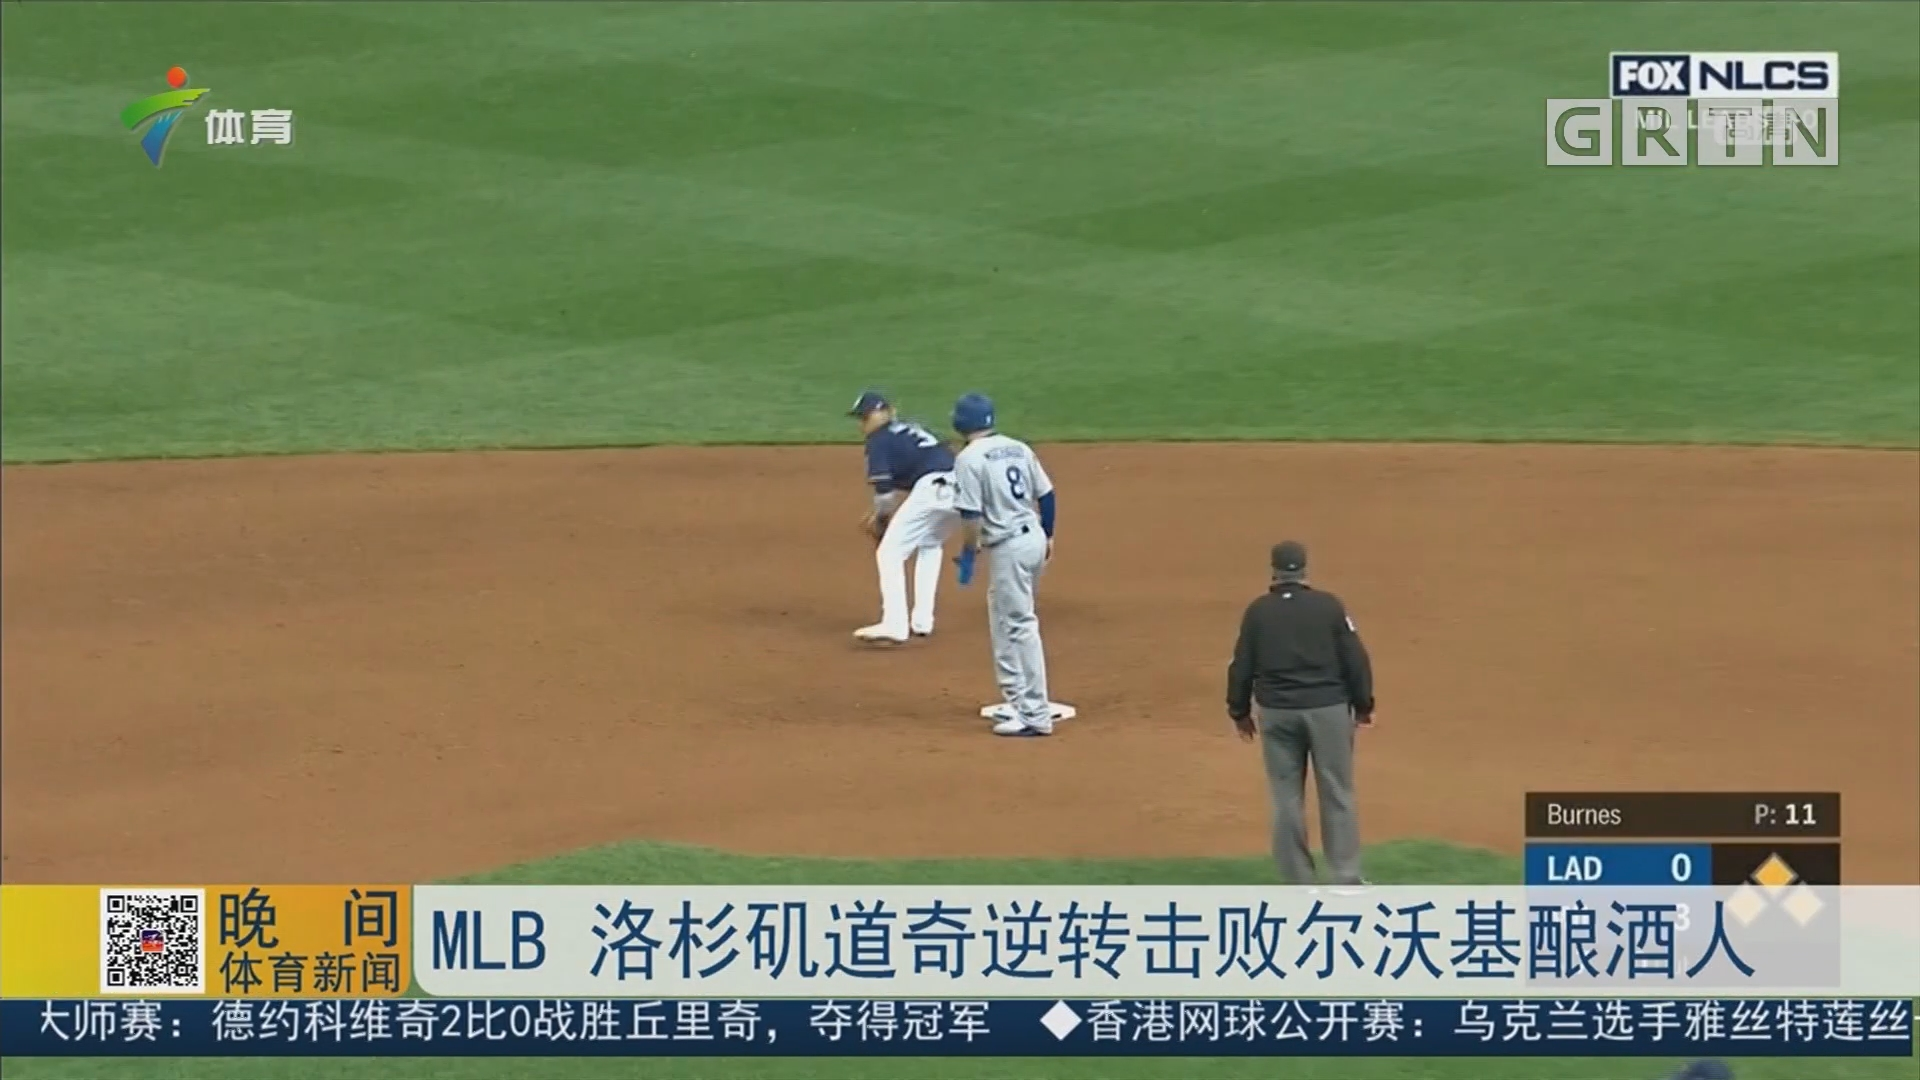 MLB 洛杉矶道奇逆转击败尔沃基酿酒人